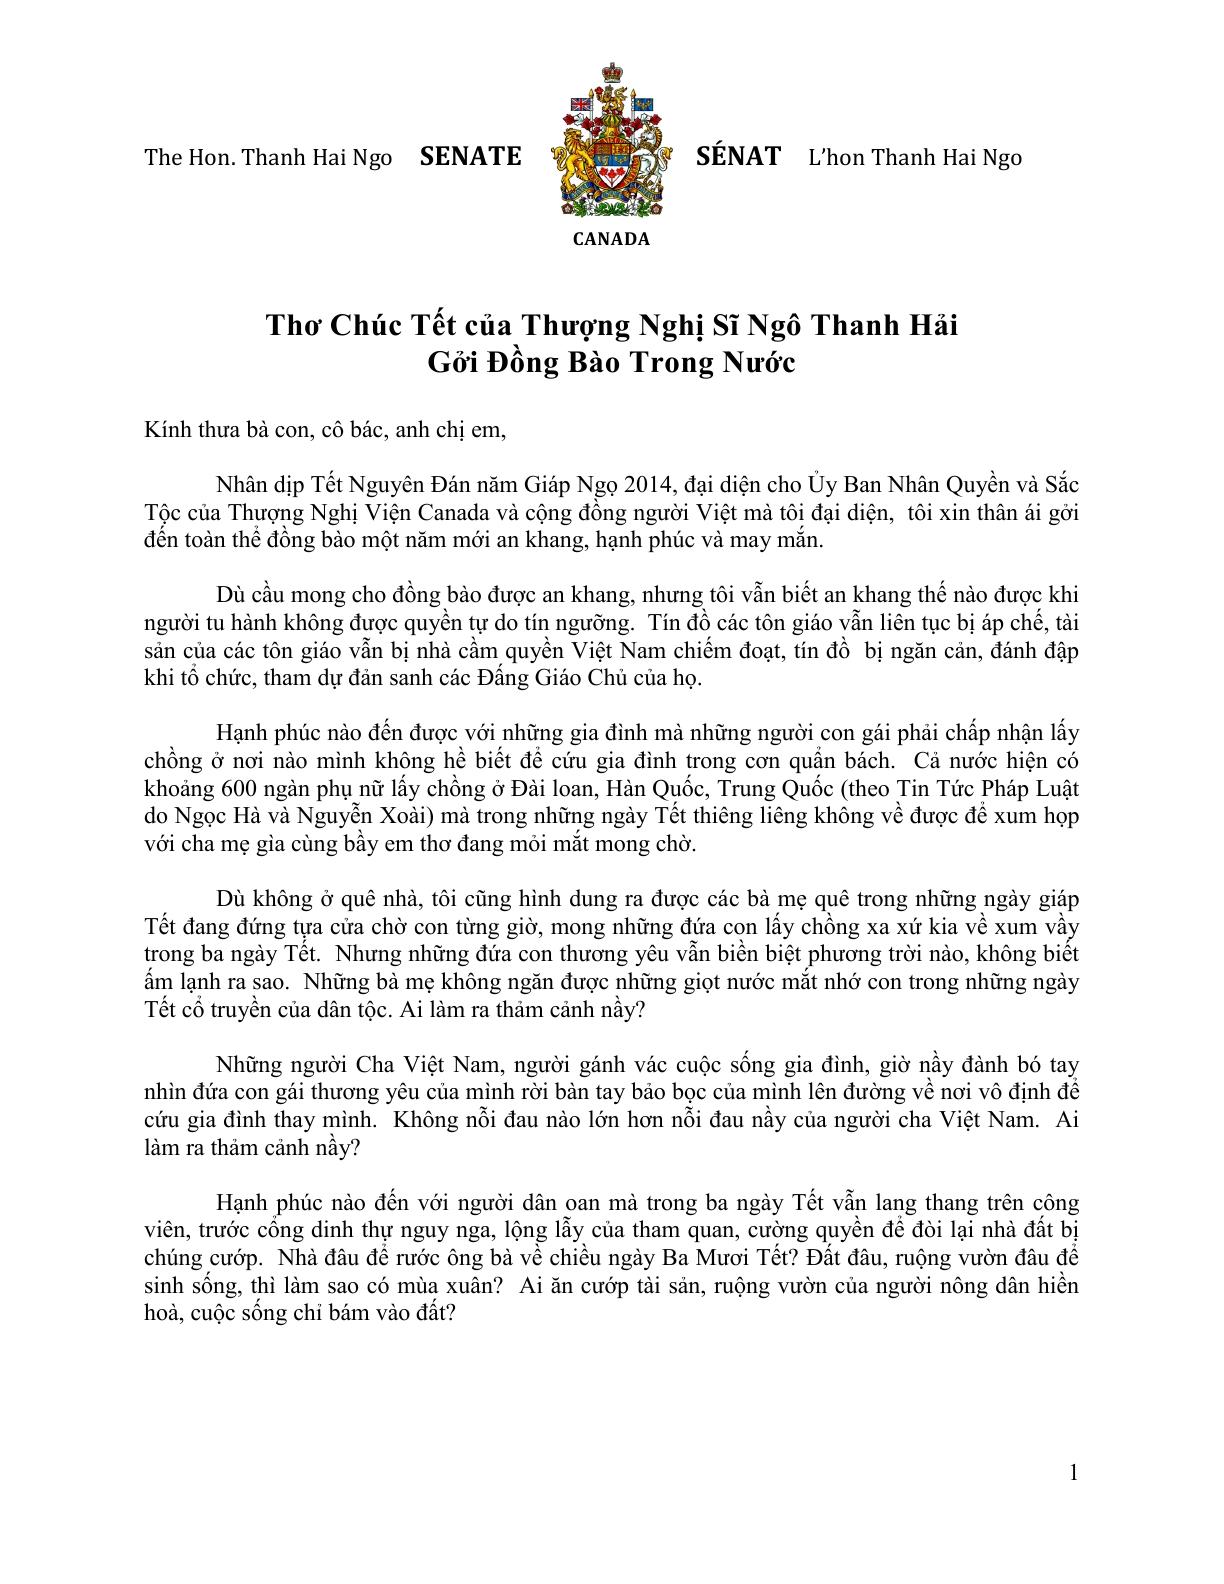 Message-from-Senator-Ngo-Tho-Chuc-Tet1